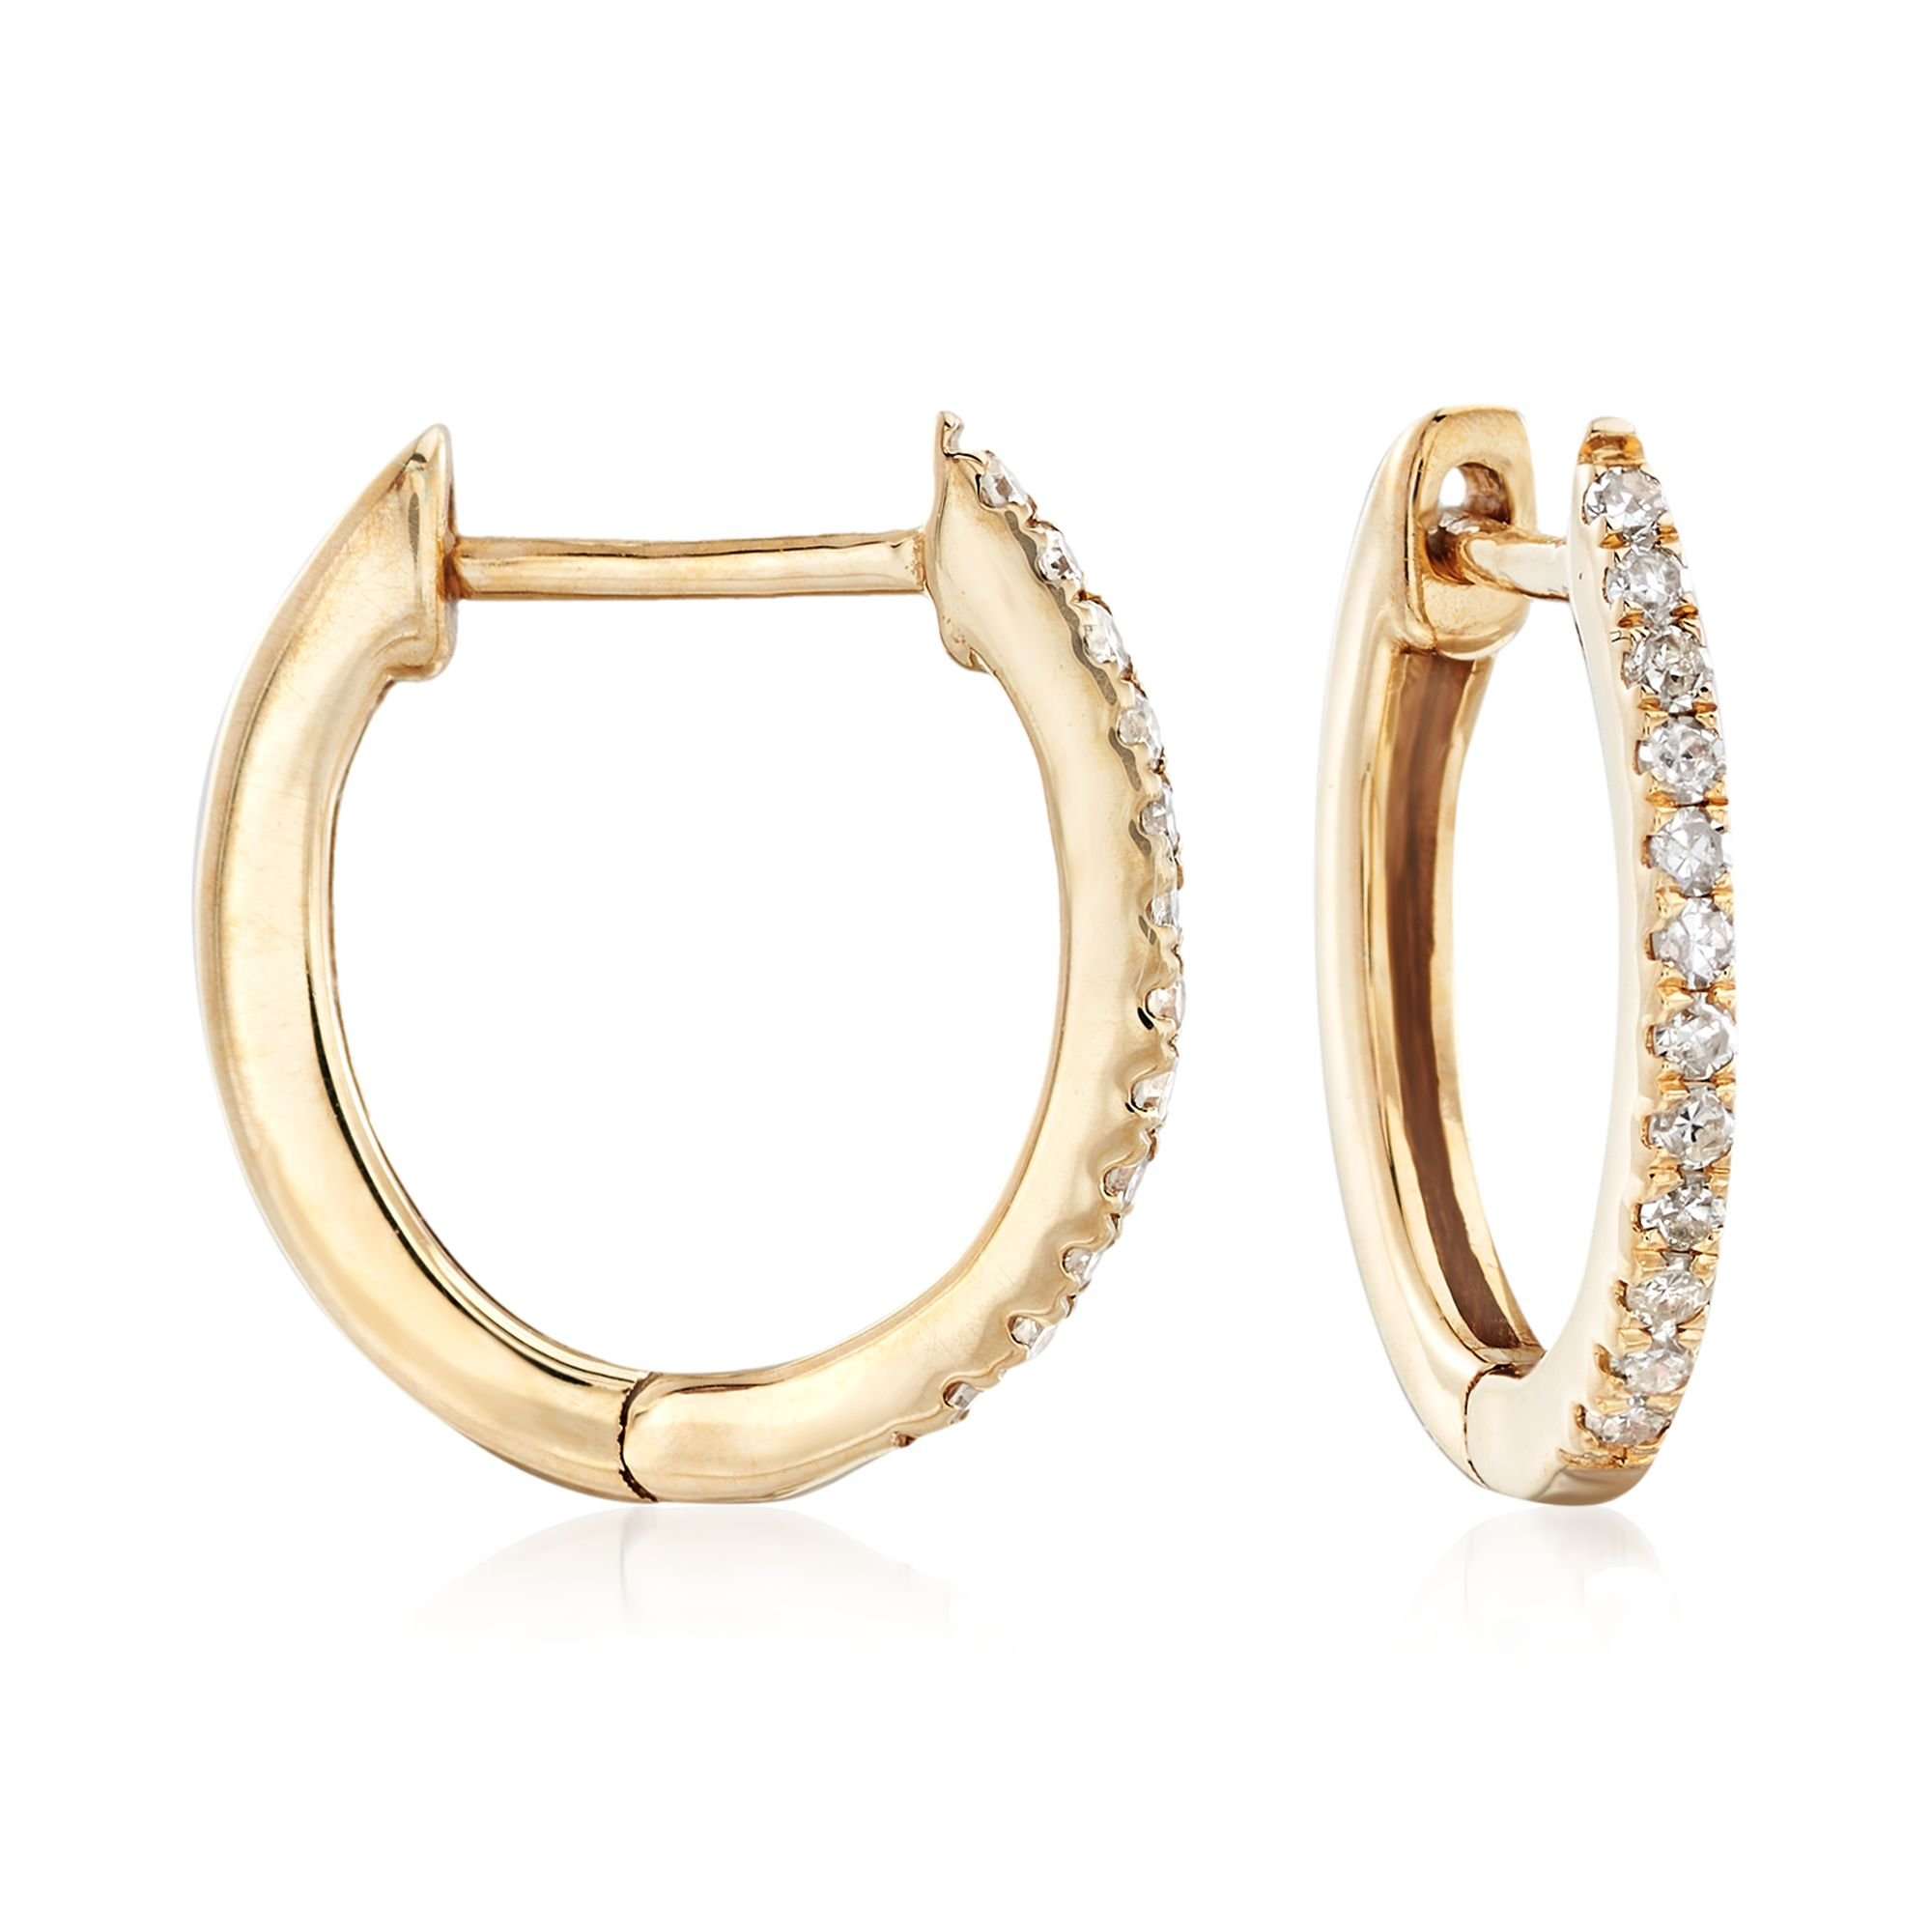 Ross-Simons 0.10 ct. t.w. Diamond Huggie Hoop Earrings in 14kt Yellow Gold by Ross-Simons